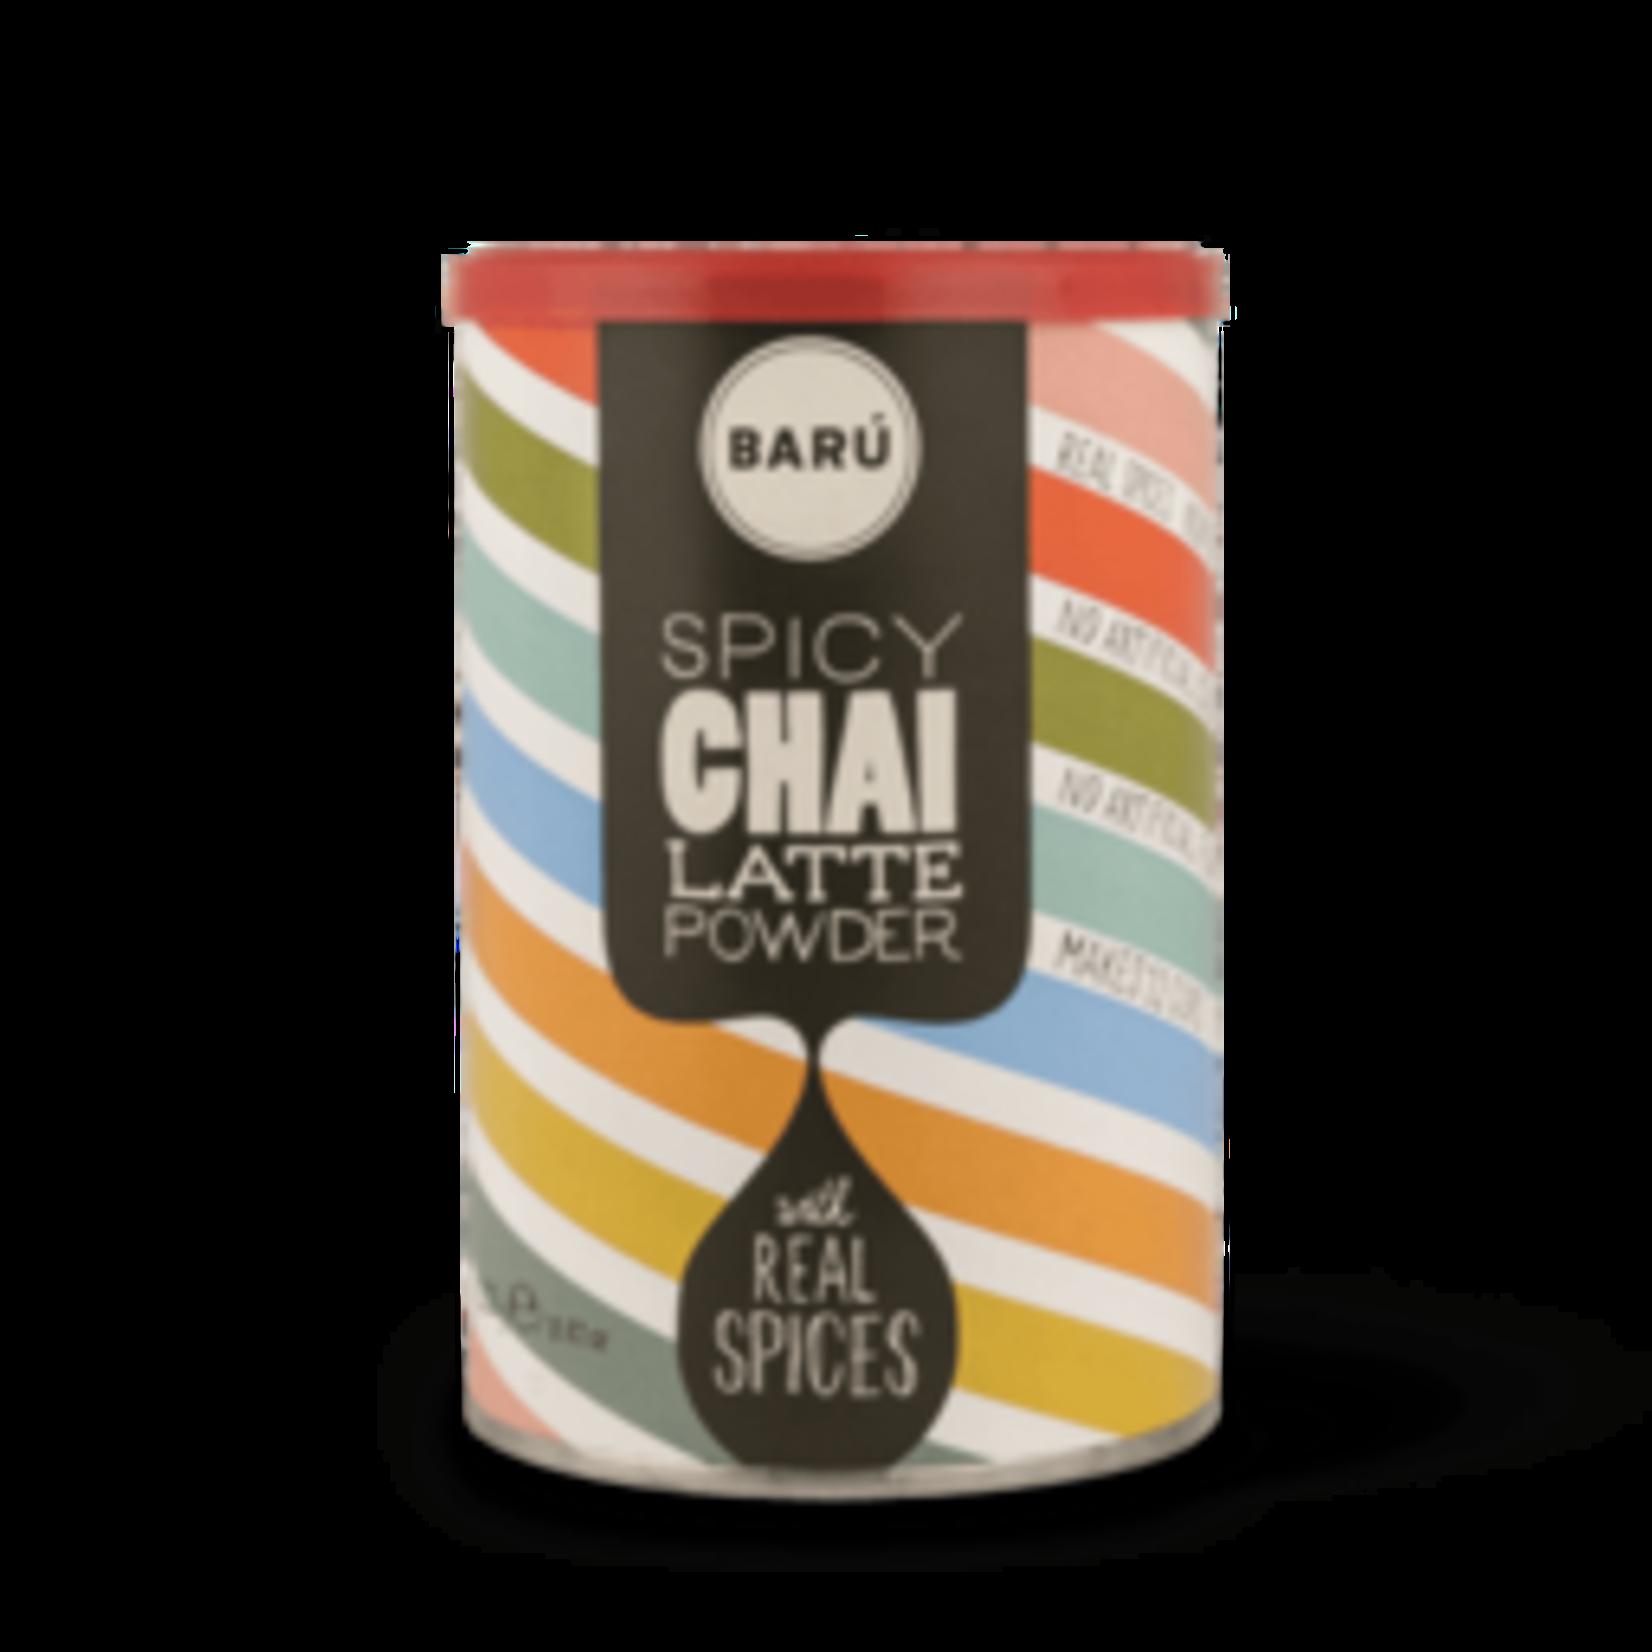 Barú Spicy Chai Latte Powder